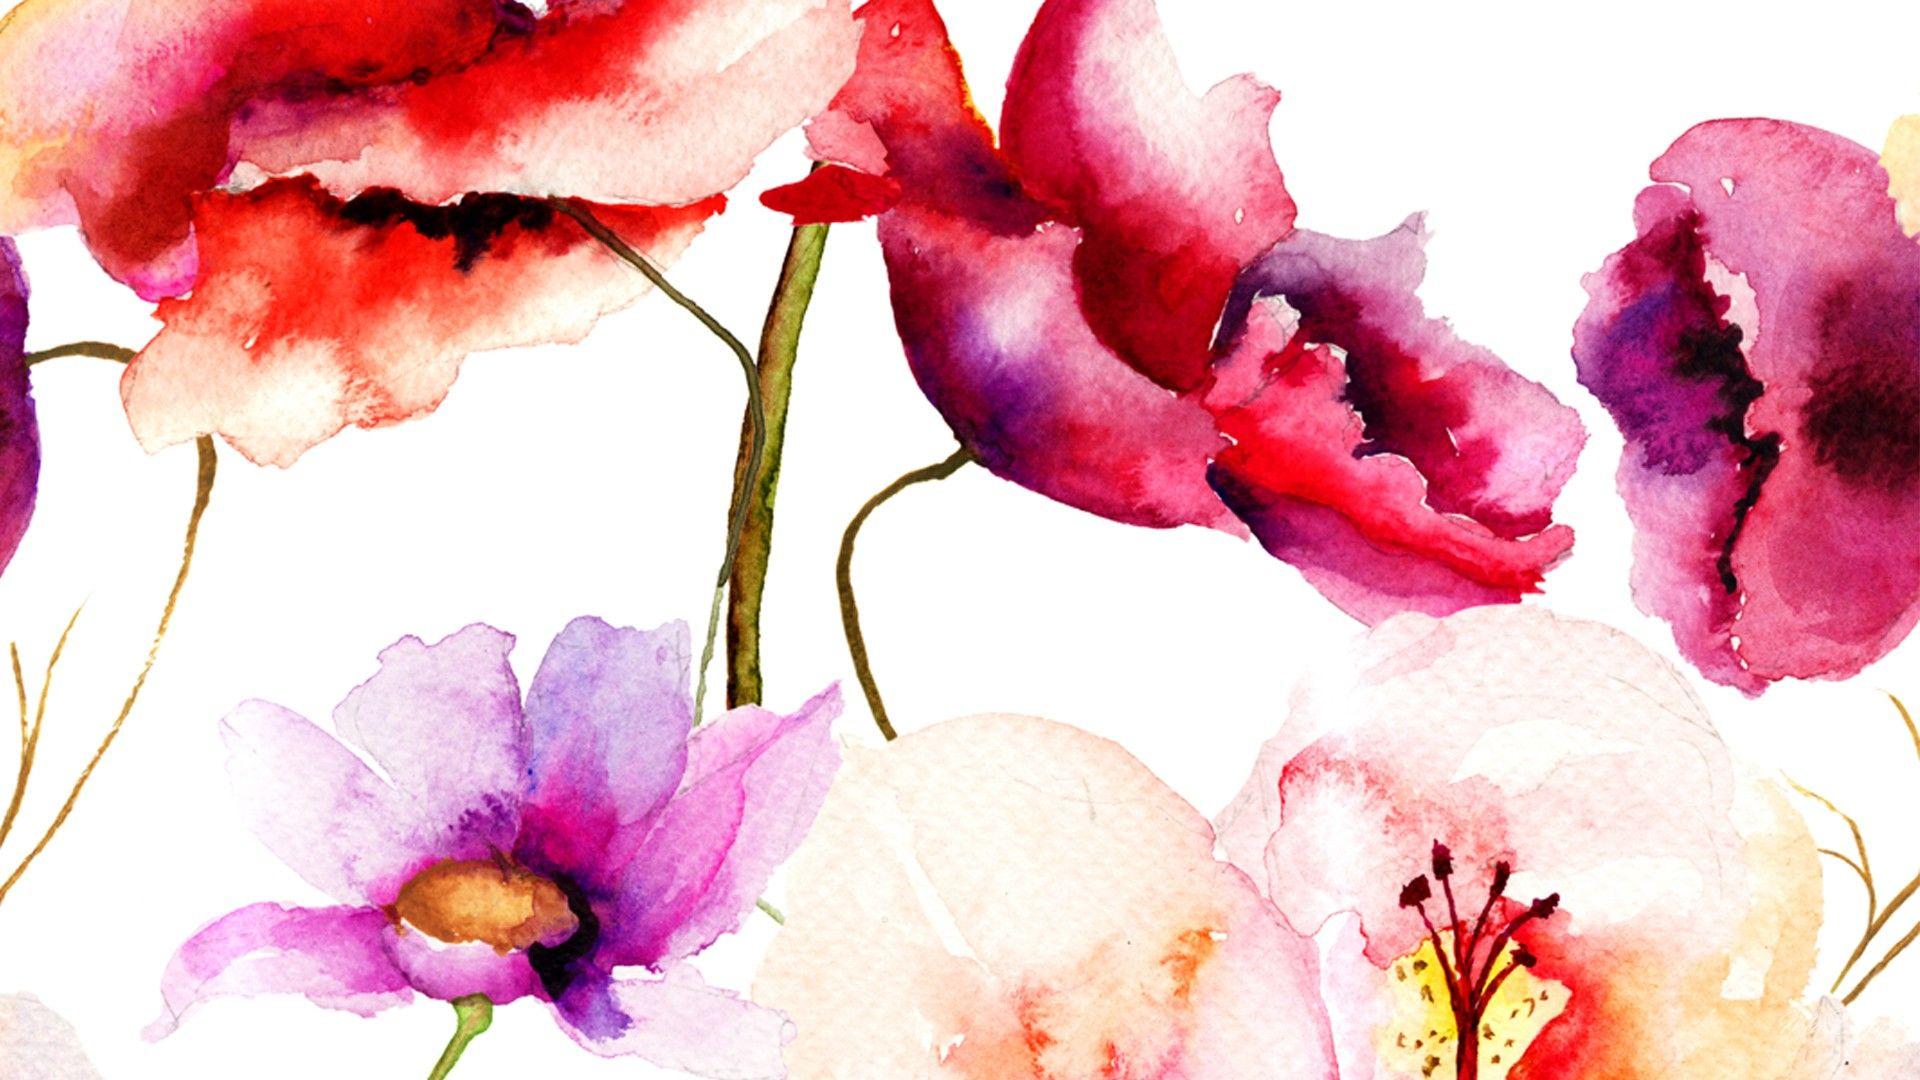 Roses In Watercolor Hd Desktop Background Wallpapers Hd Free